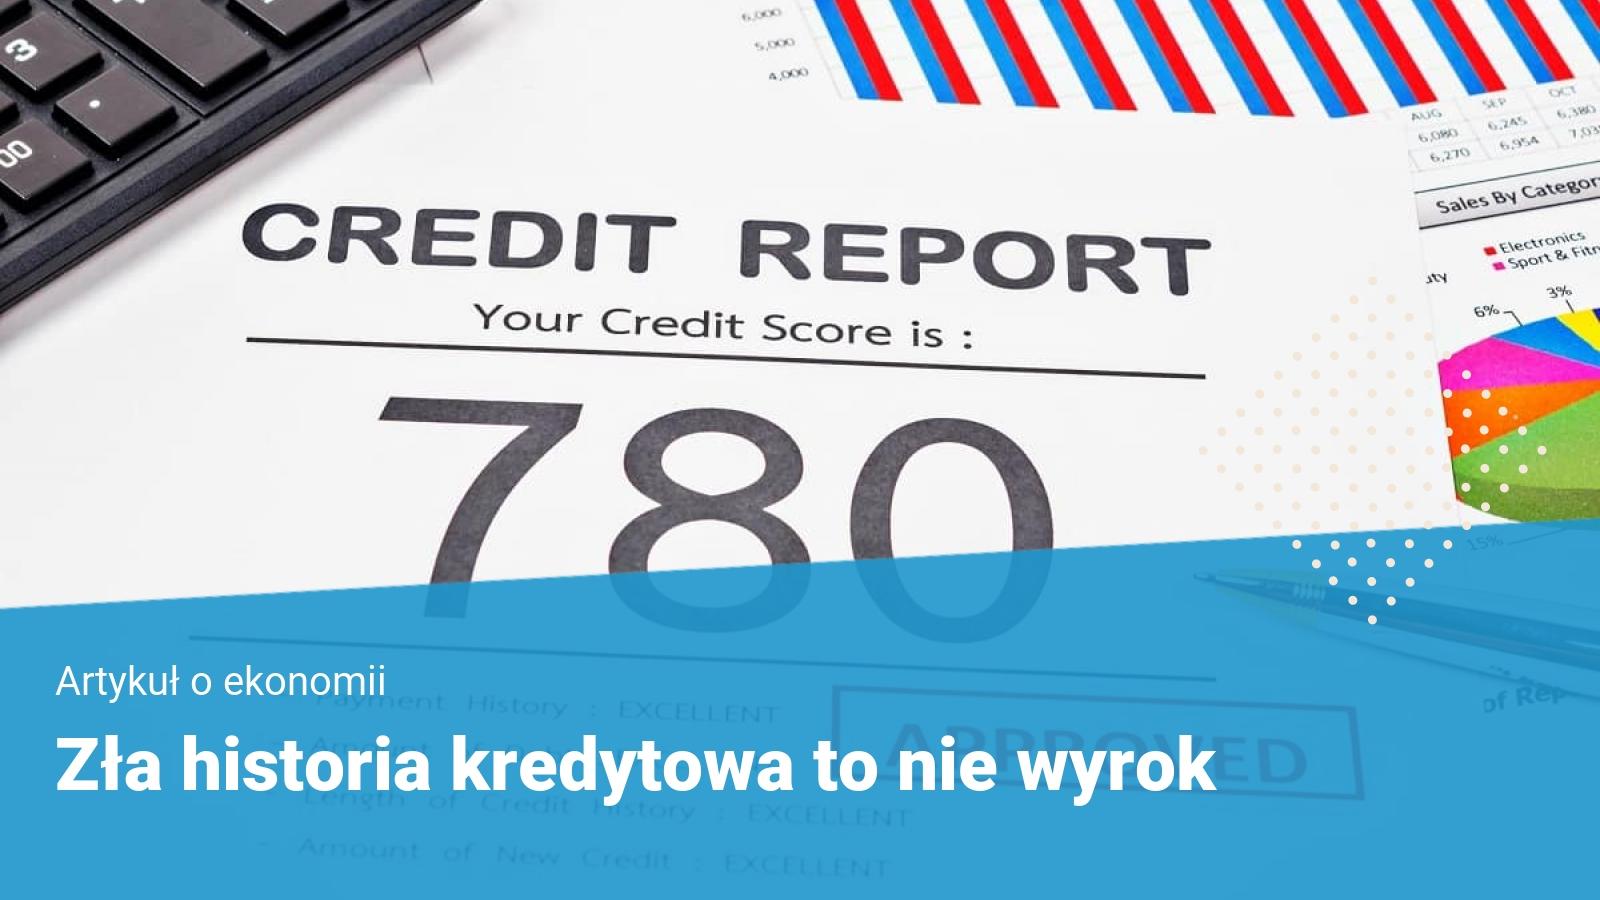 zla historia kredytowa